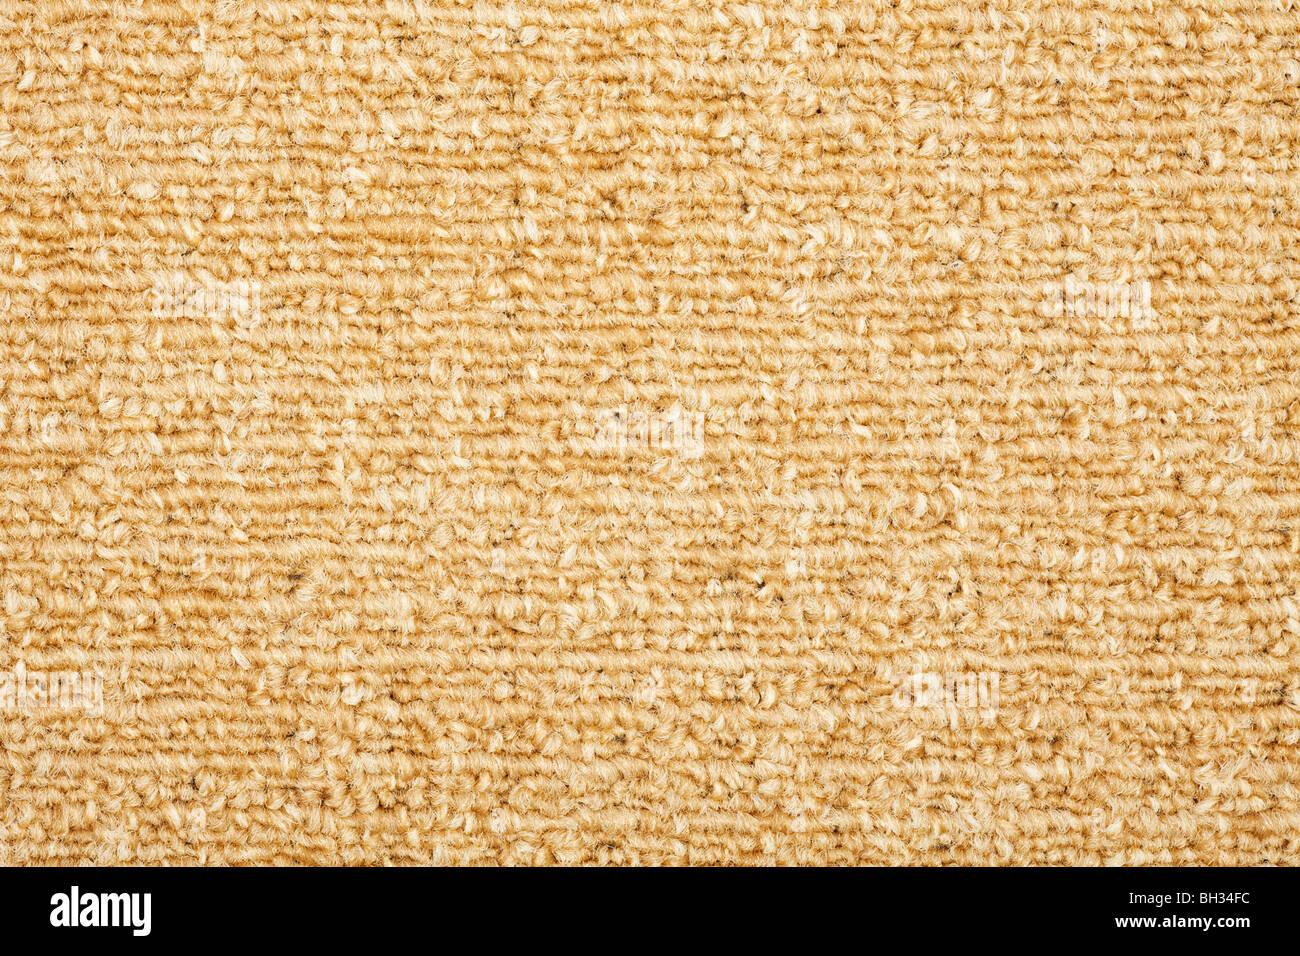 Teppich hautnah Hintergrundtextur Stockbild